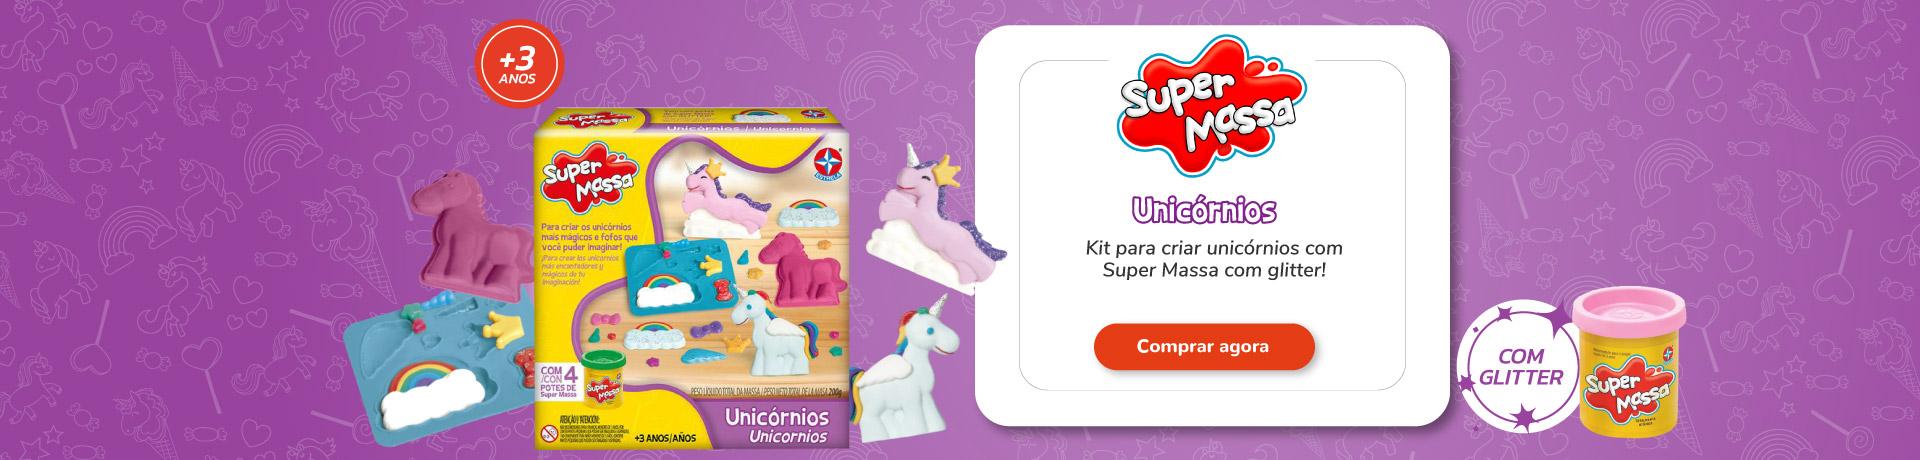 Super Massa Unicornios